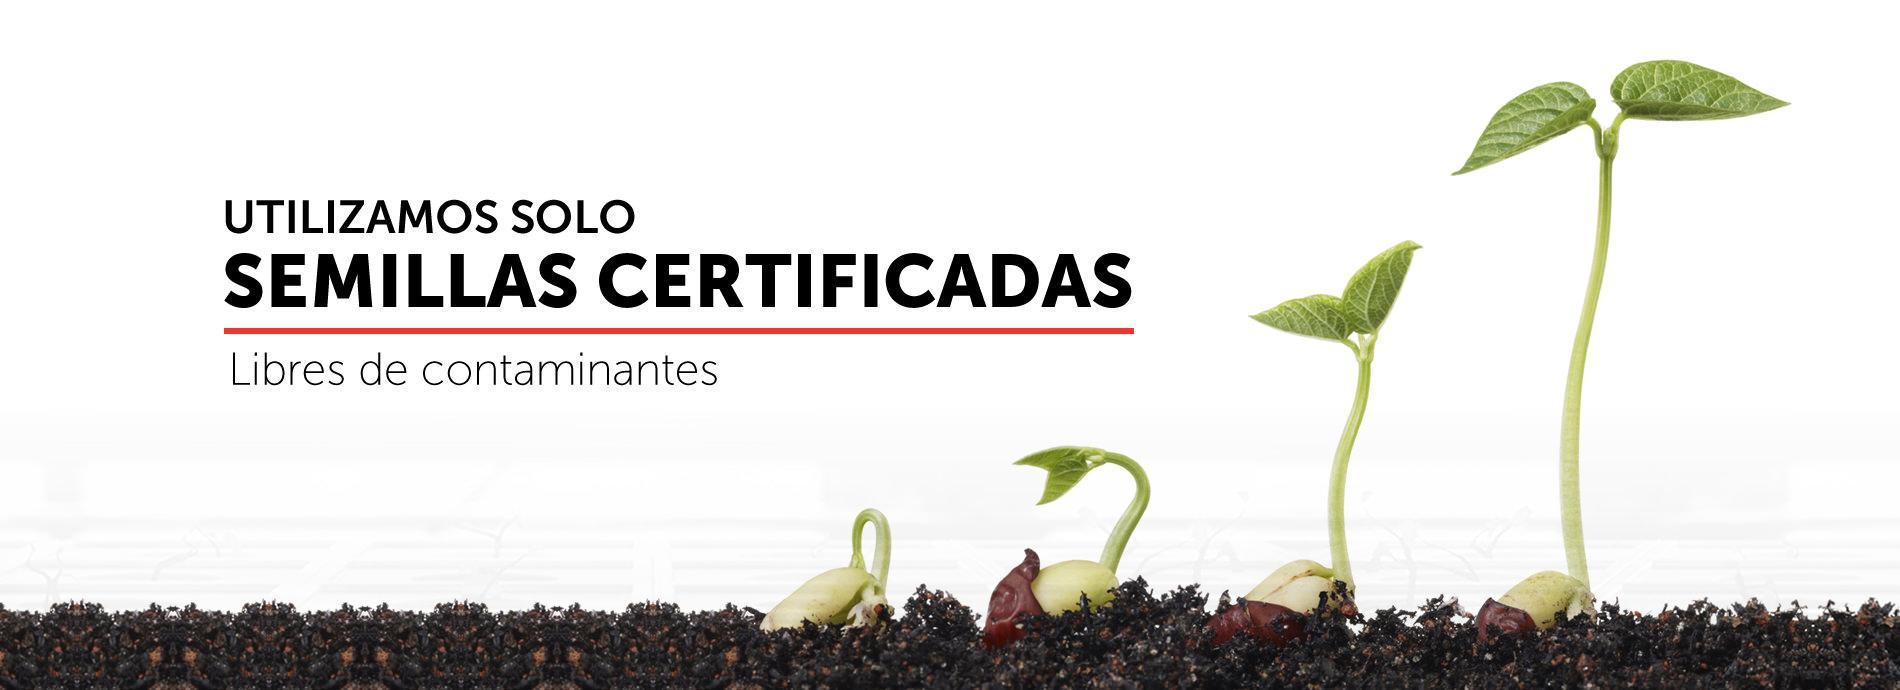 Utilizamos solo semillas certificadas libres de contaminantes